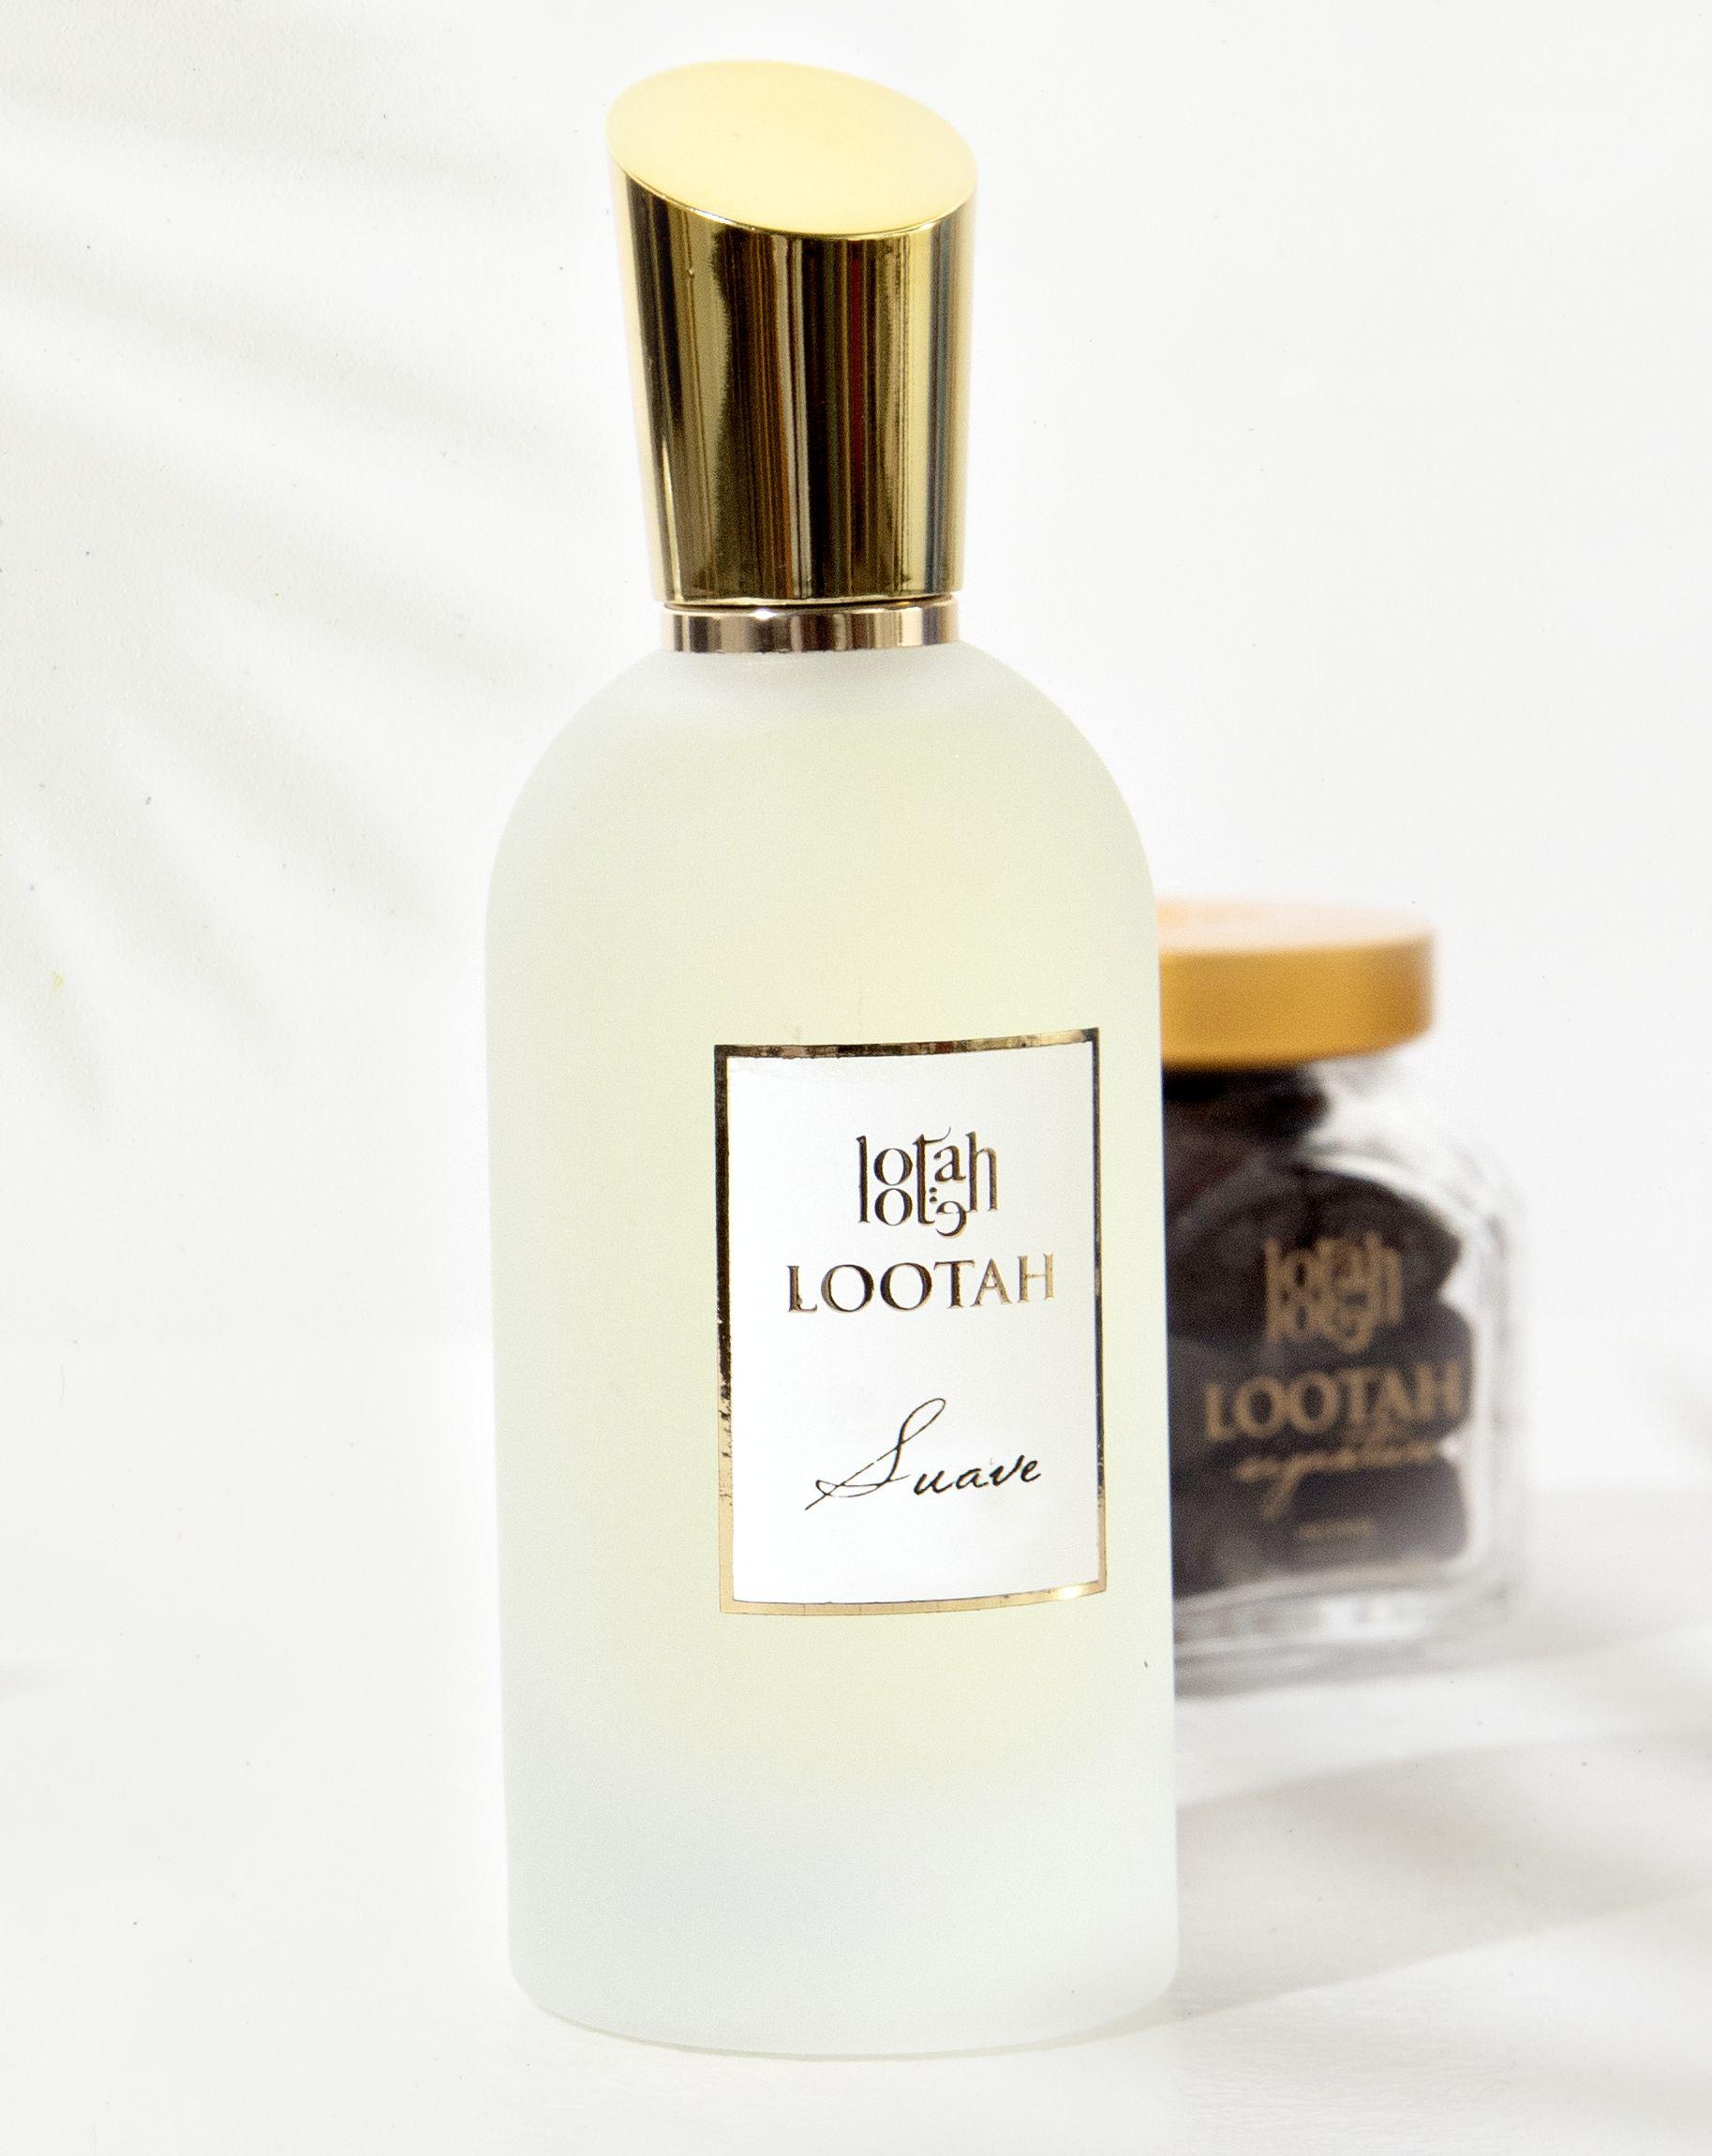 سواف عبق يحكي روايات عطرية من خلال نوتاته الوردية Suave A Perfume That Tells Stories Through Its Captivating Ro Perfume Perfume Bottles Fragrance